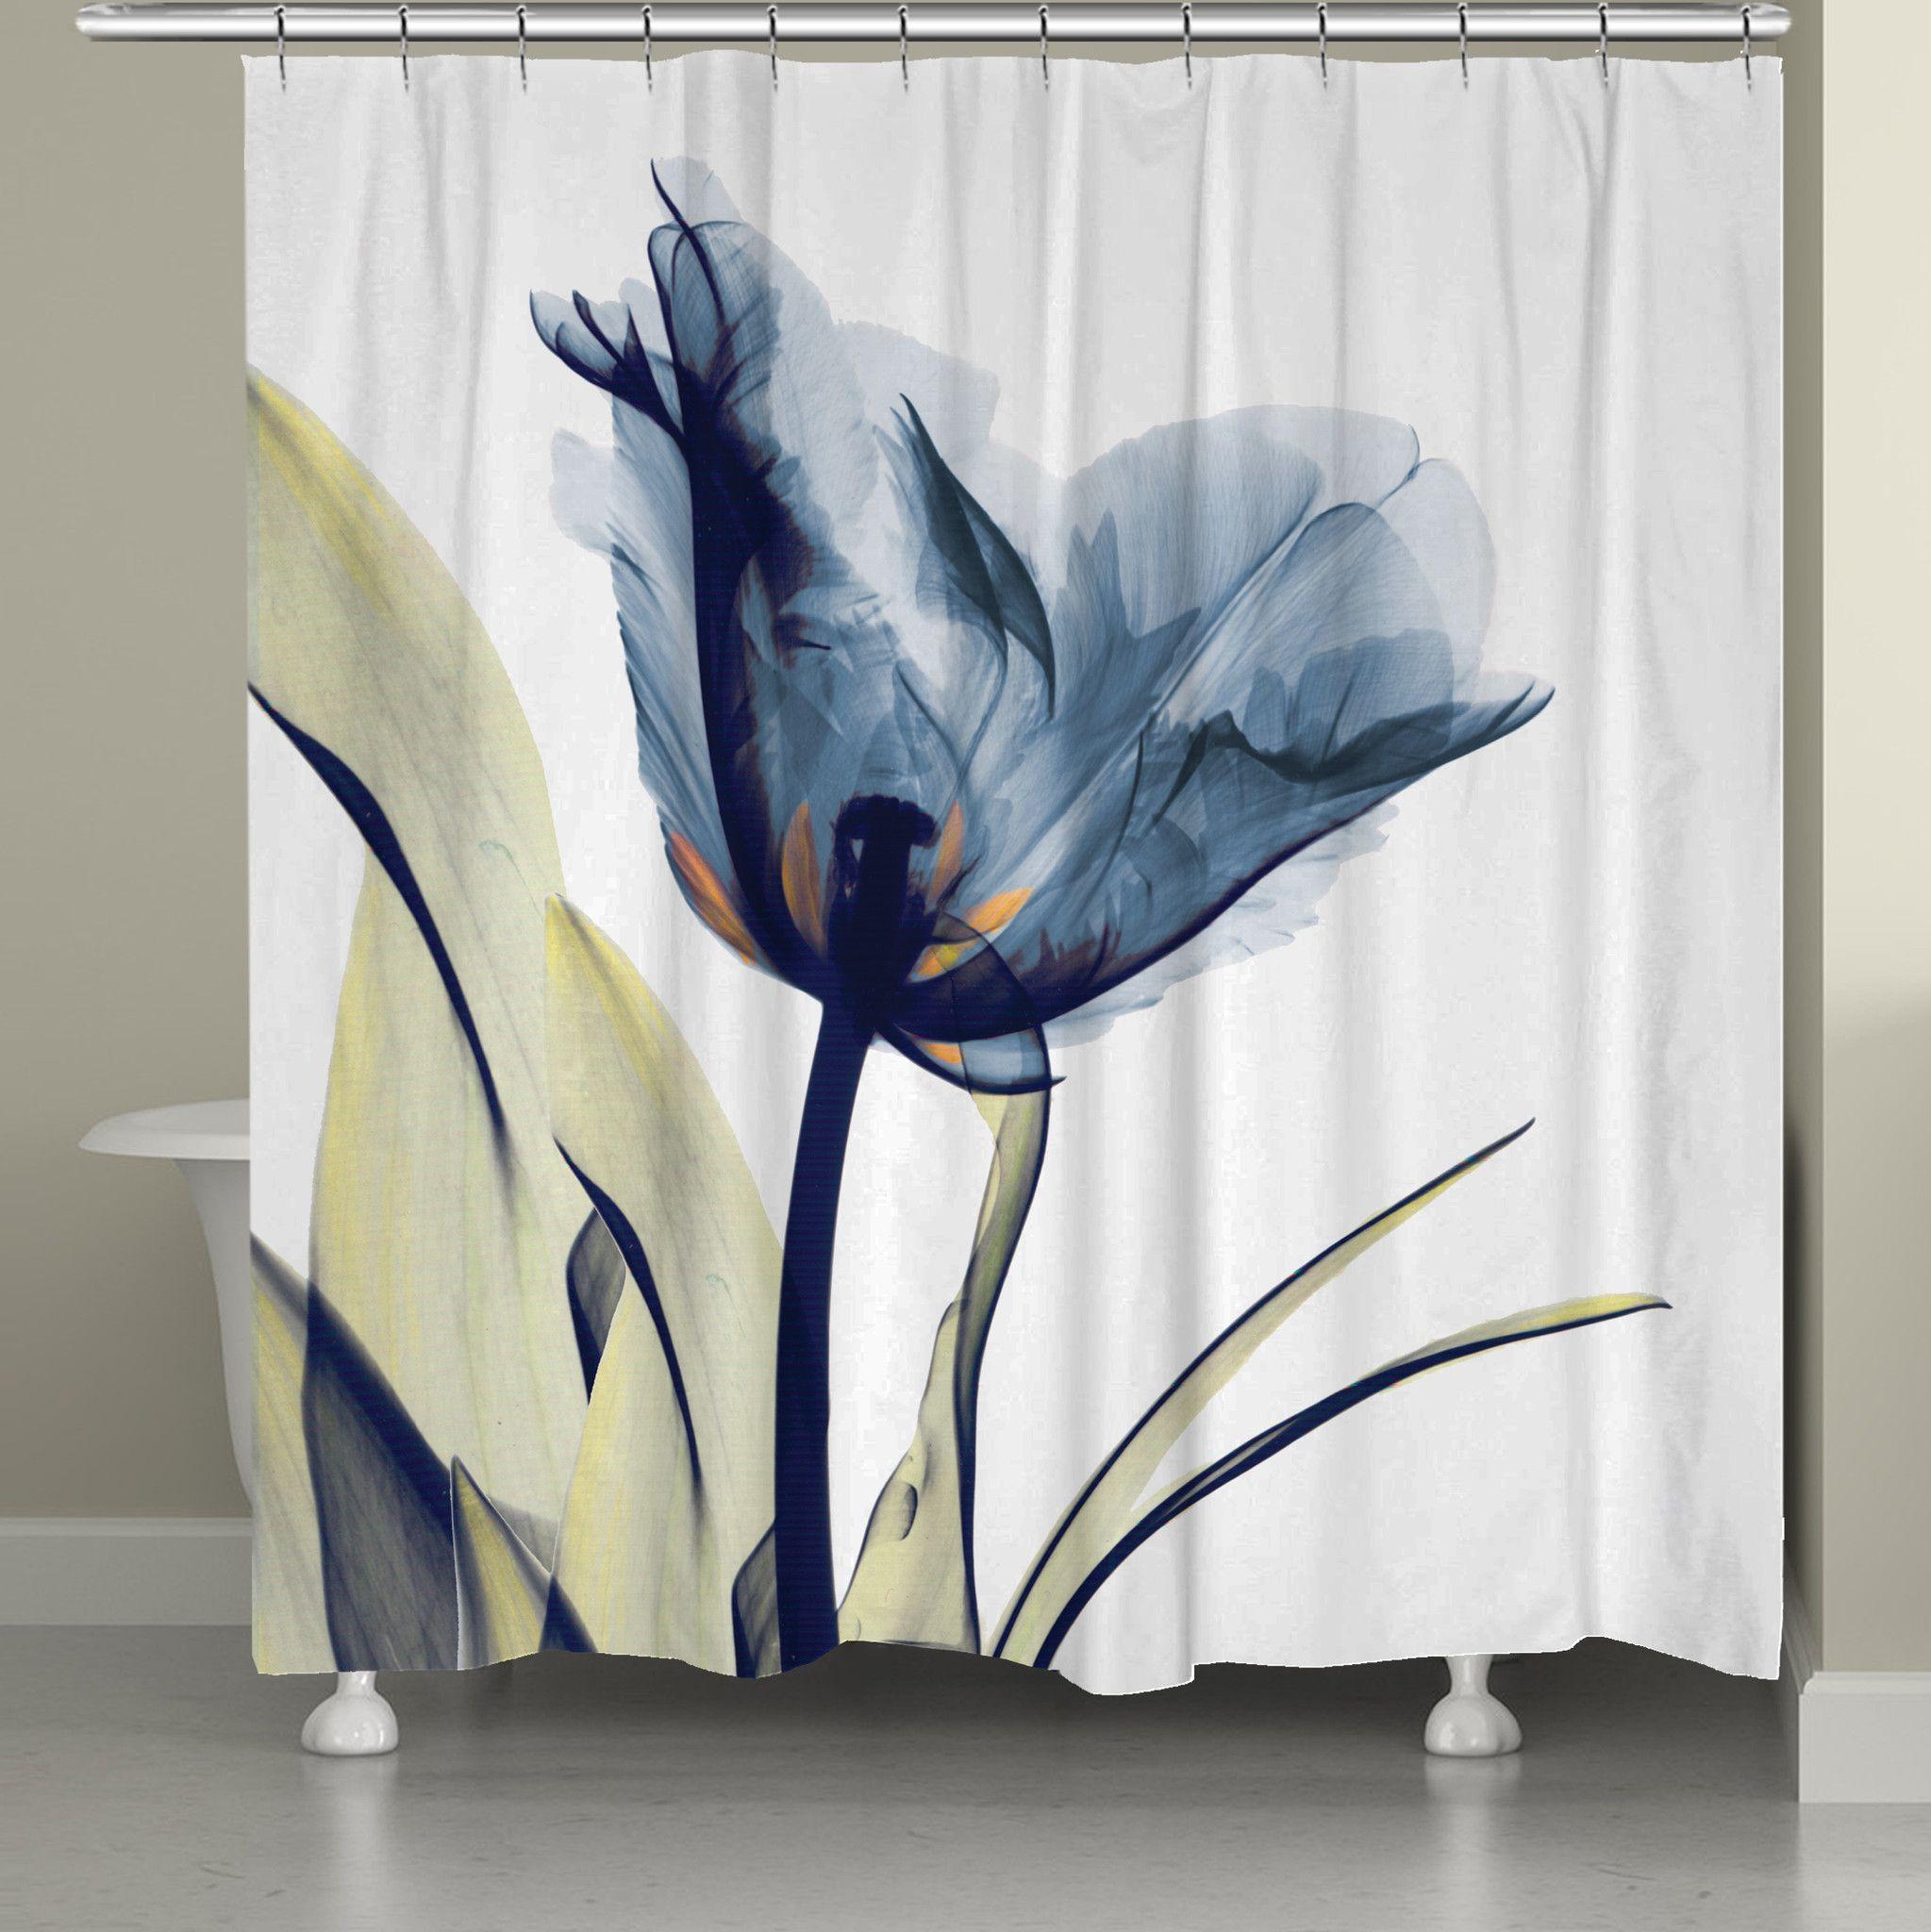 Blue Tulip Trio X Ray Flowers Shower Curtain Tulip Shower